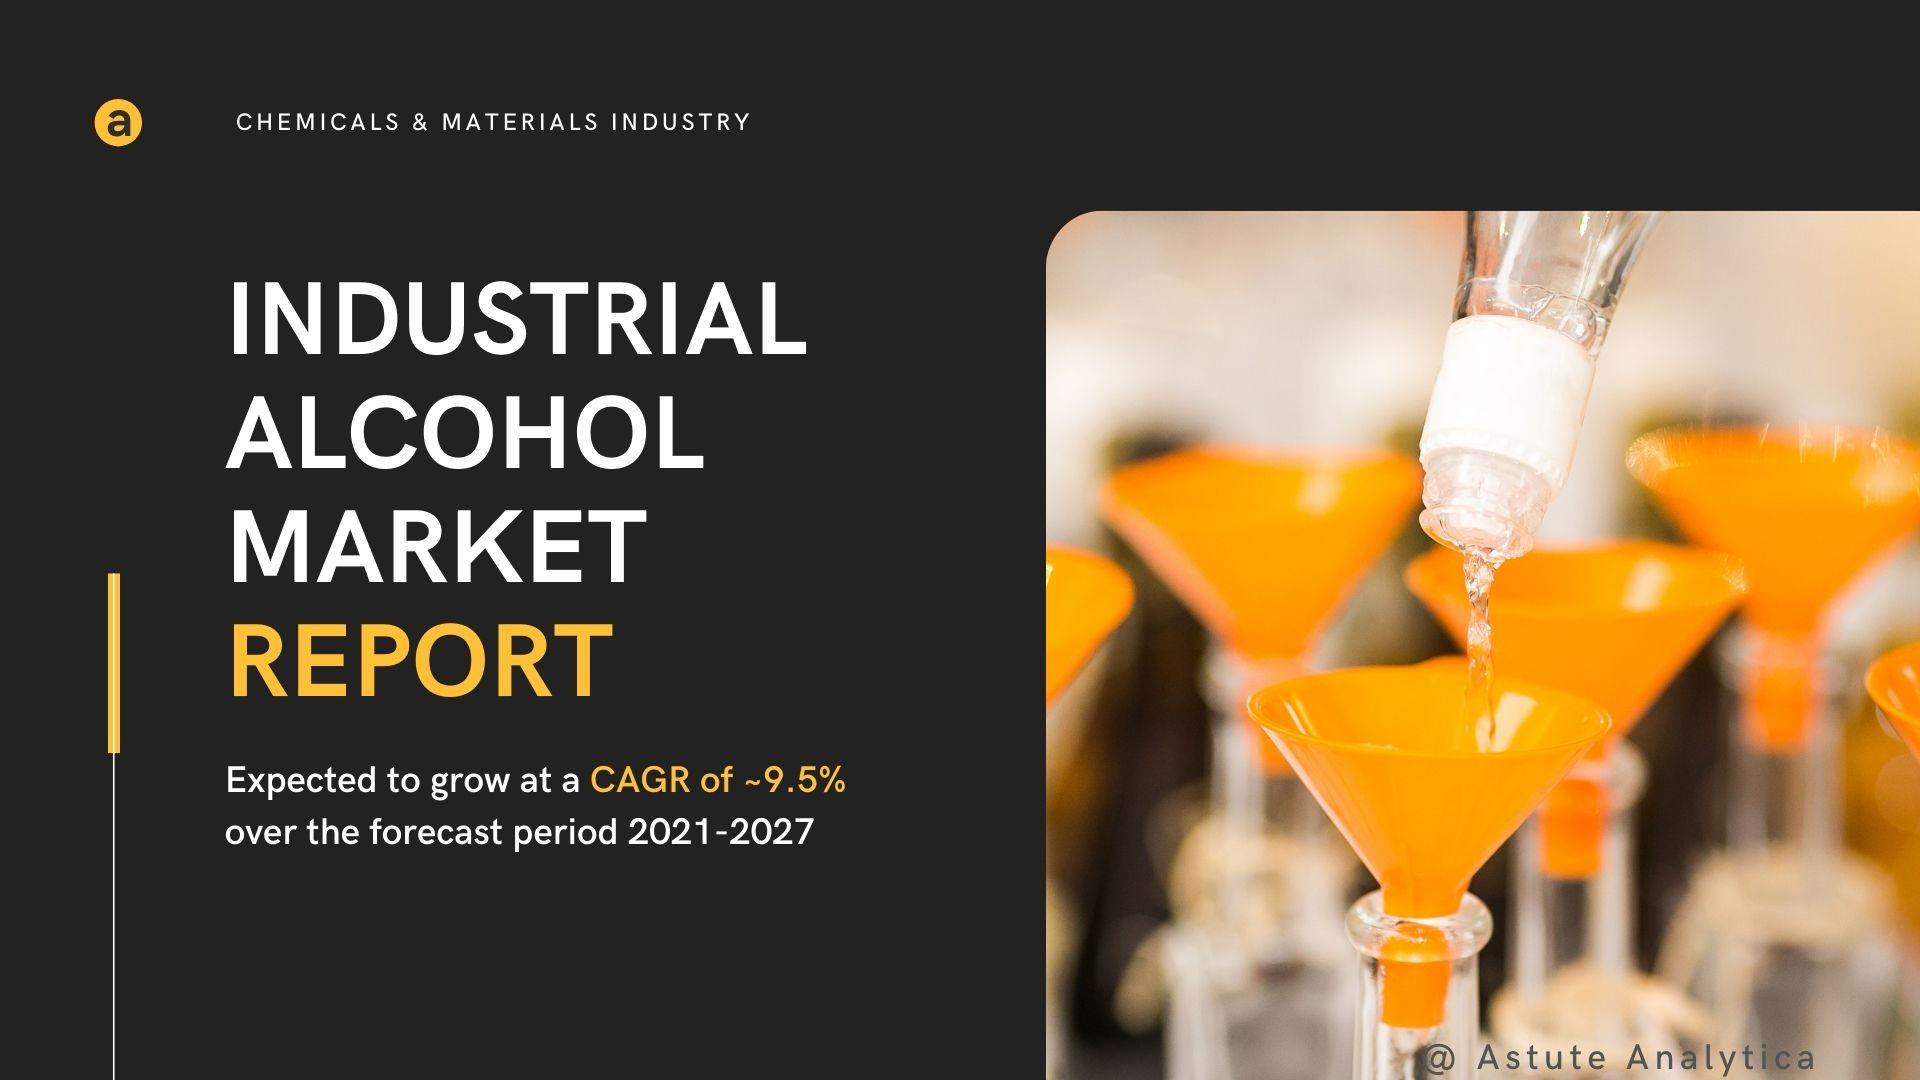 Exclusive research report on industrial alcoholmarket 2021; Major players - Cargill Inc., Raizen Energia, Cristalco SAS, etc